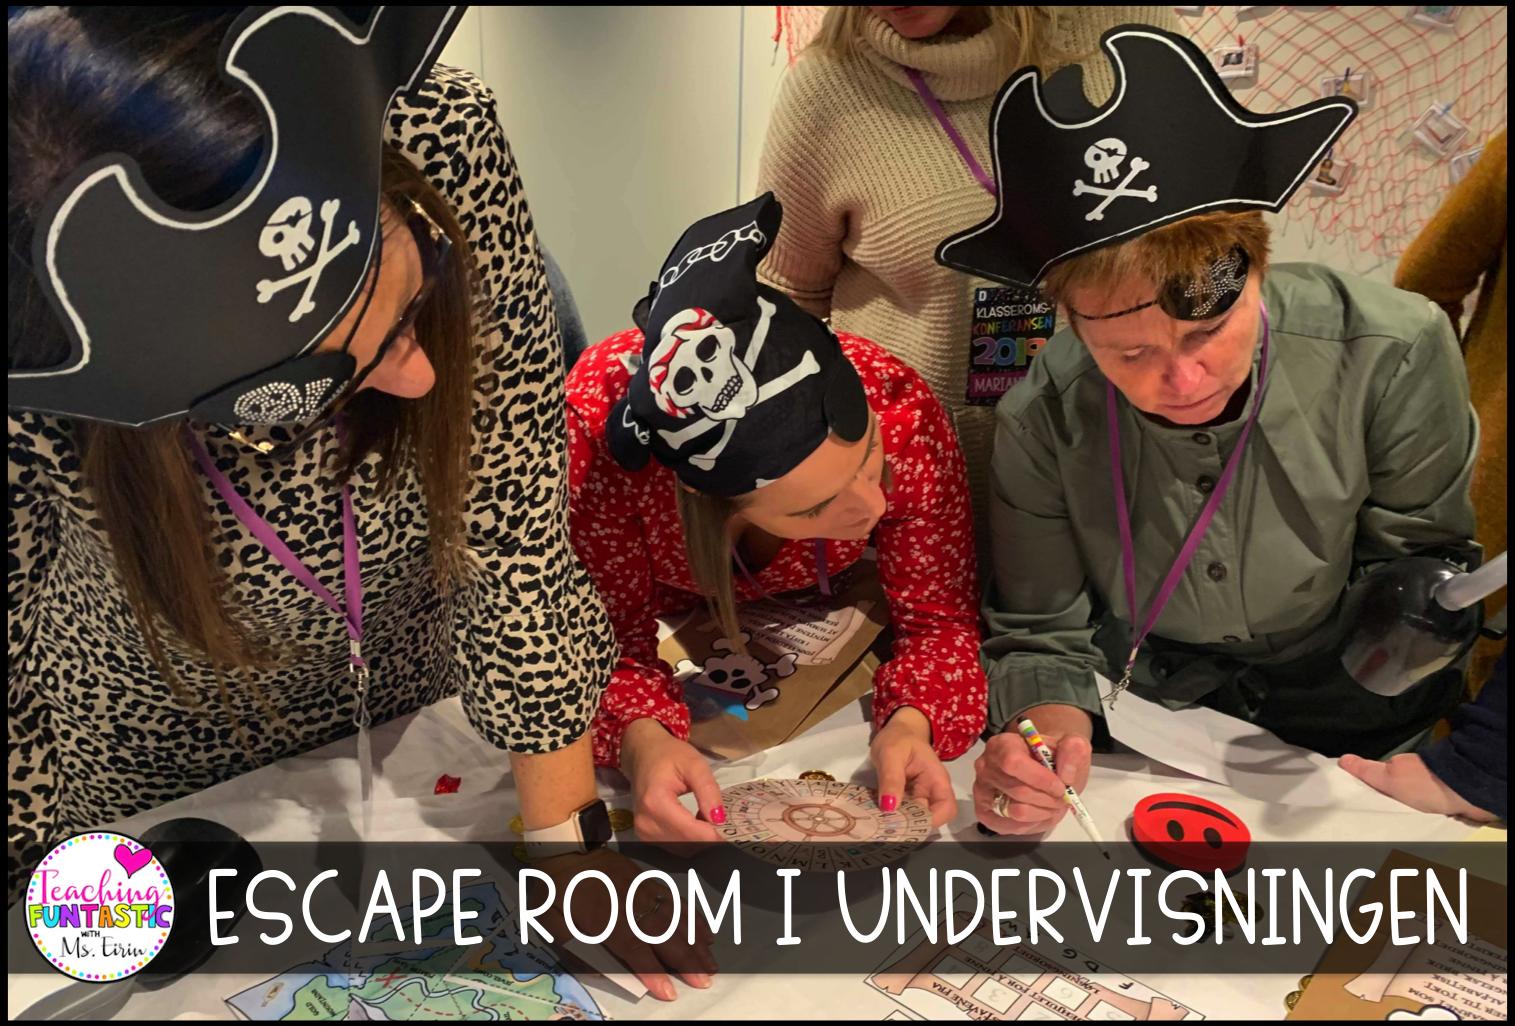 Kurs Escape Room Teaching FUNtastic